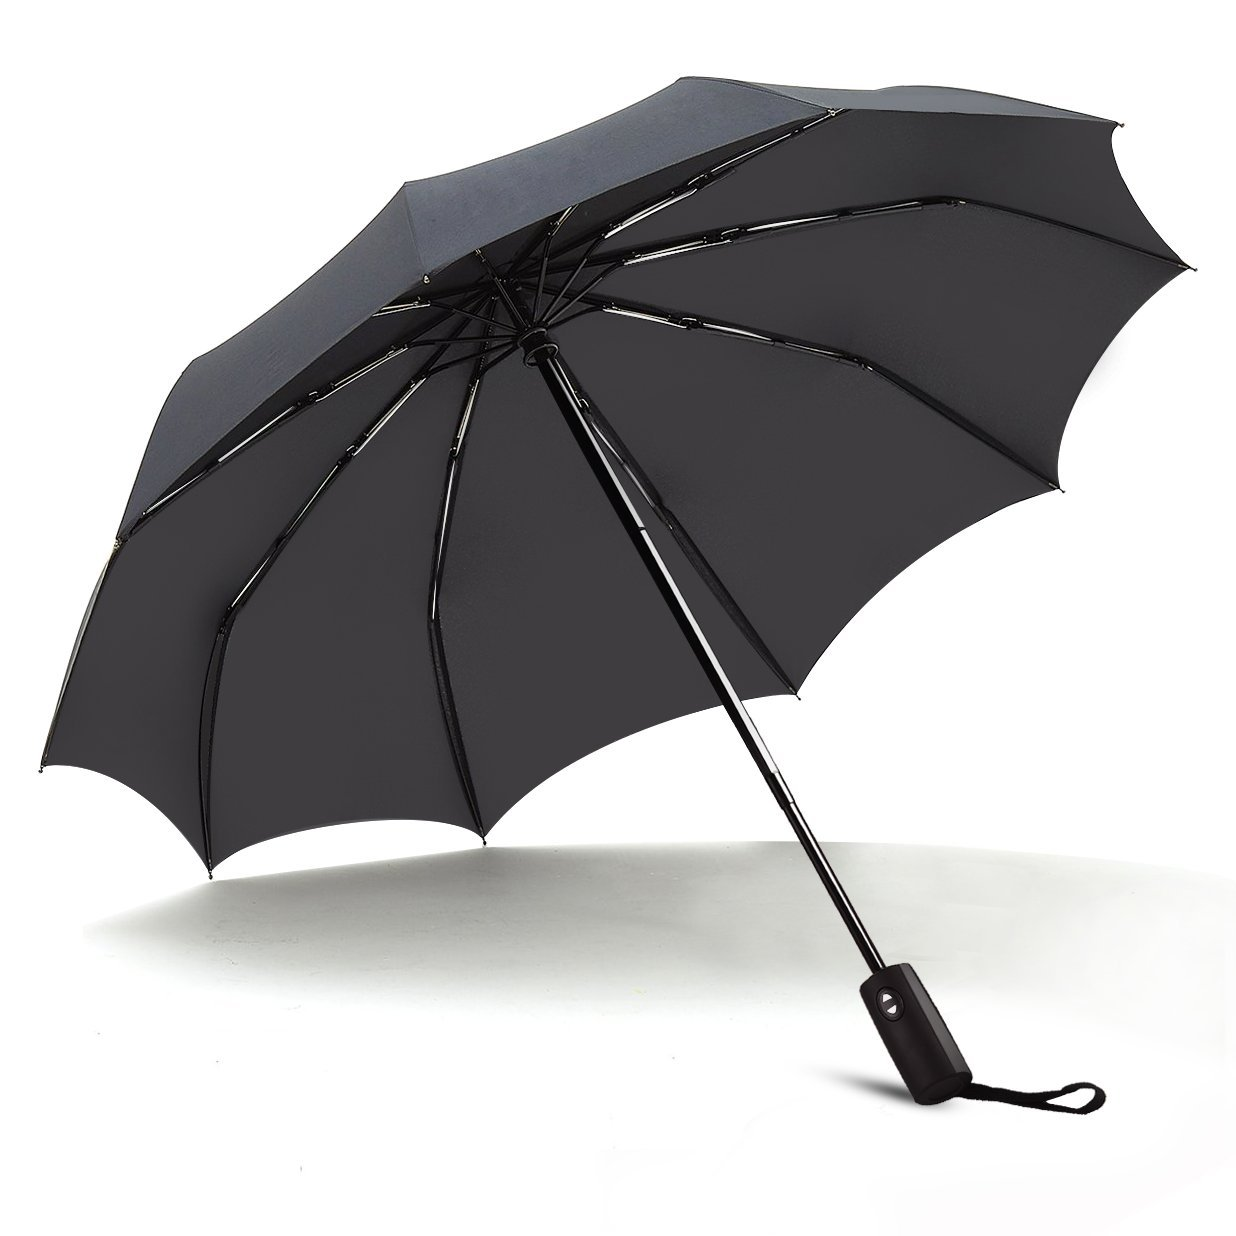 Umbrella,JUKSTG 10 Ribs Auto Open/Close Windproof Umbrella, Waterproof Travel Umbrella,Portable Umbrellas With Ergonomic Handle,Black